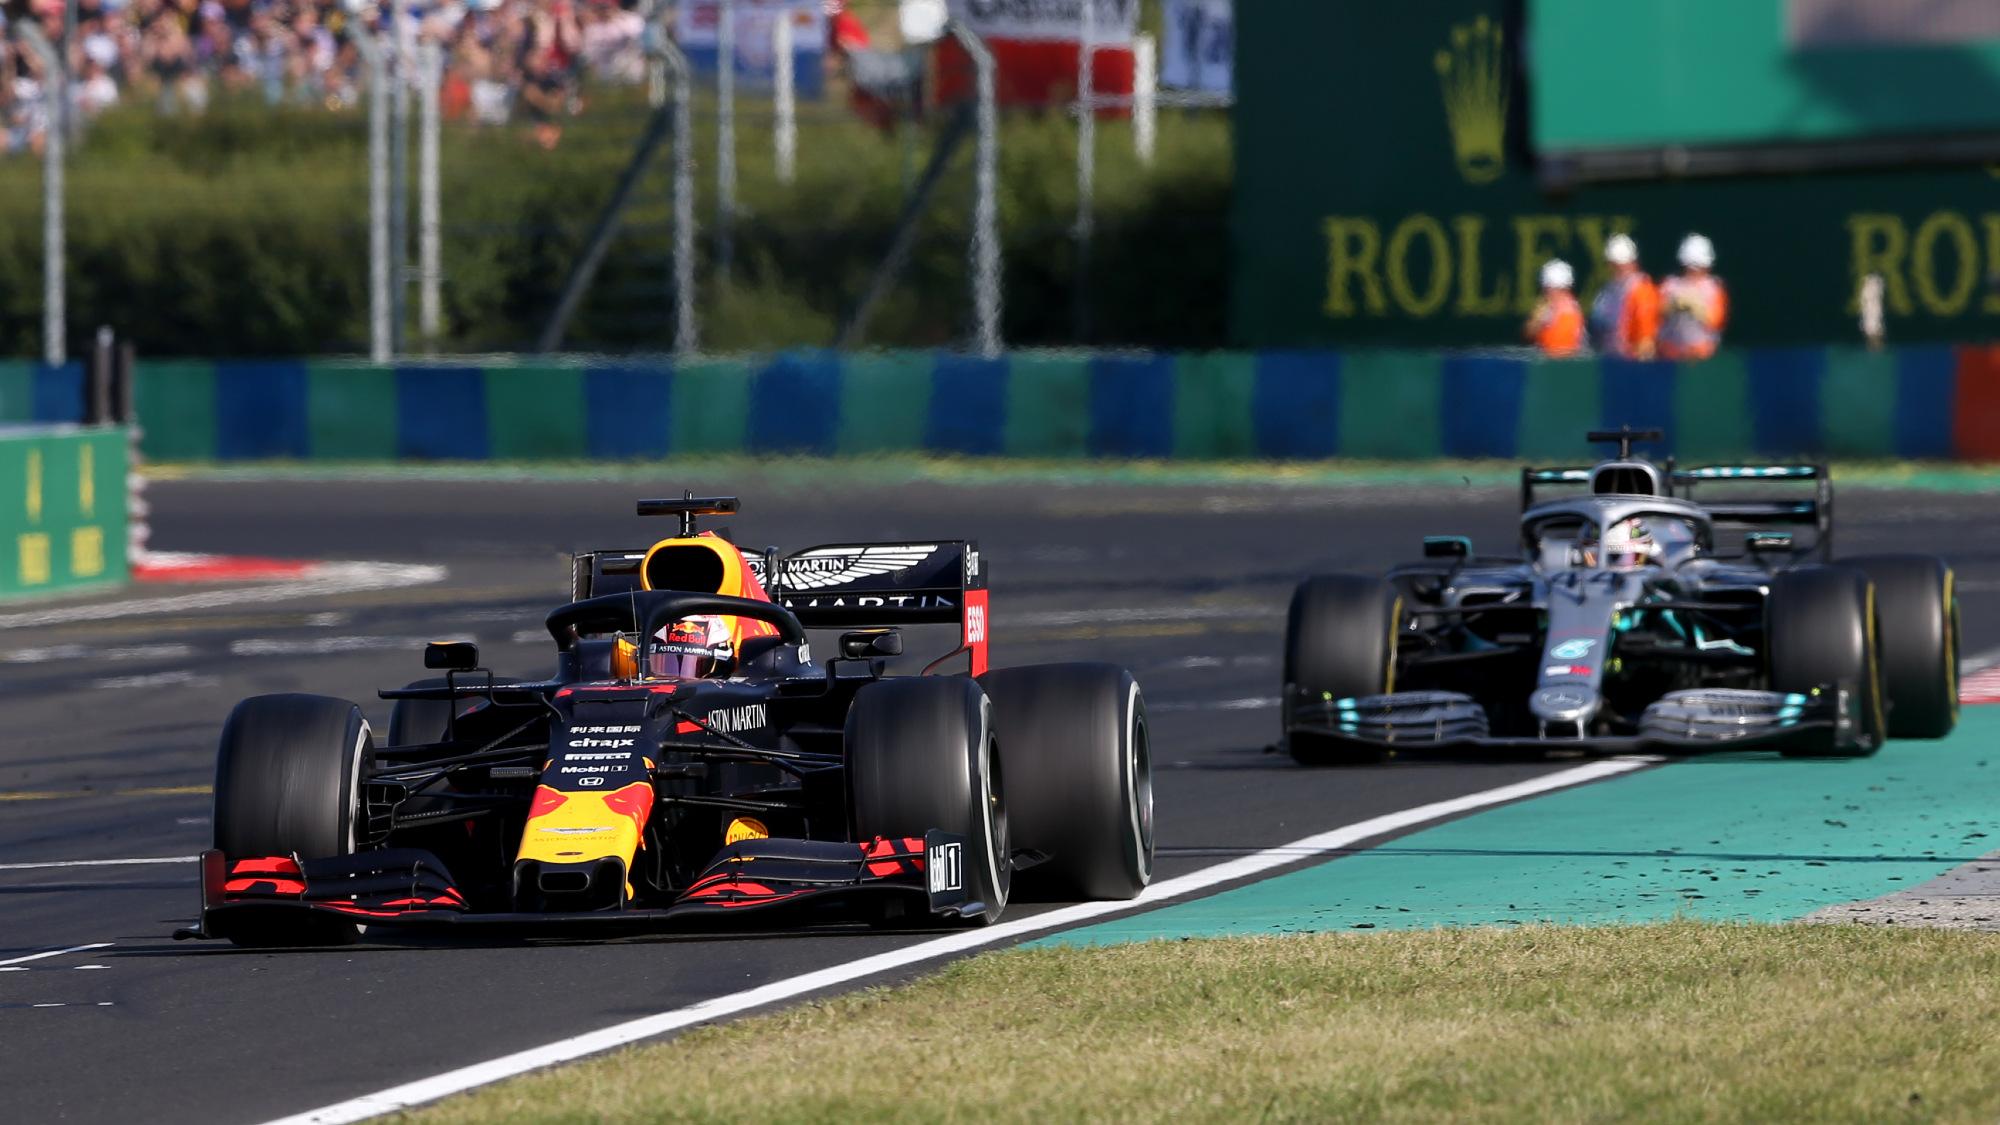 Max Verstappen, Lewis Hamilton, 2019 Hungarian GP